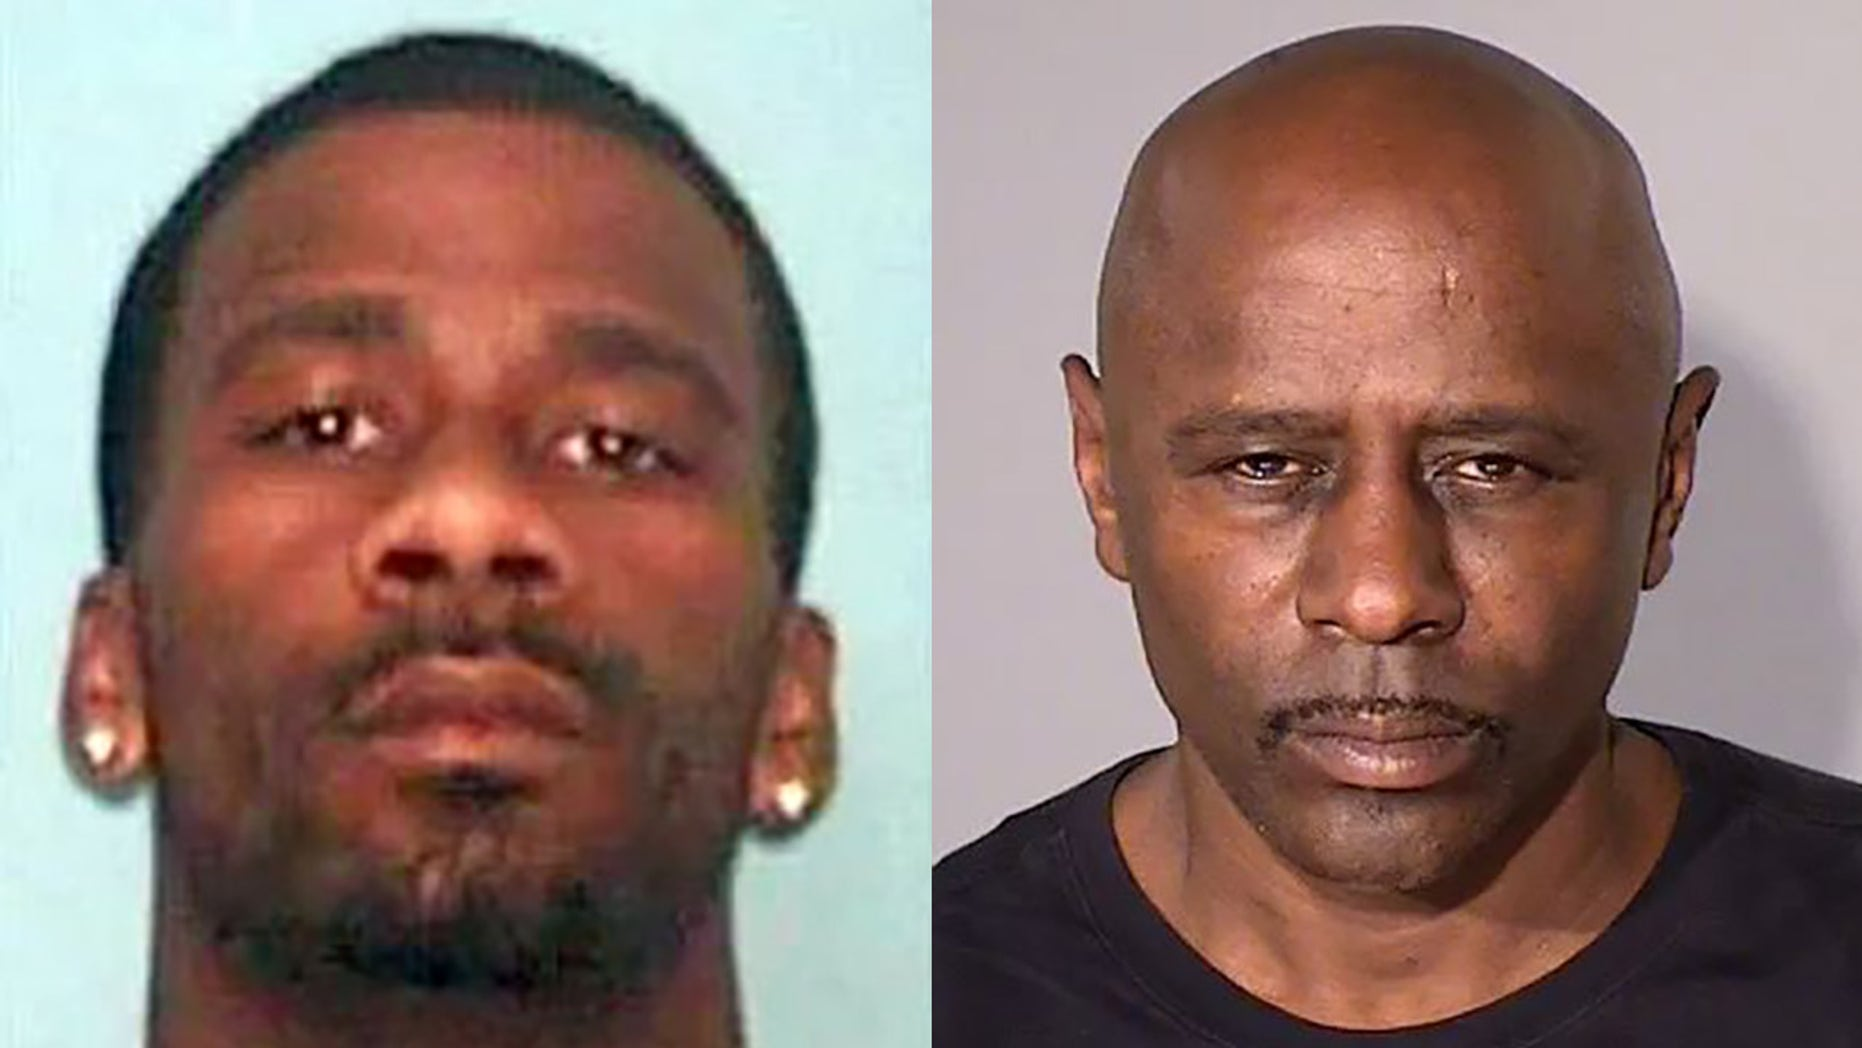 wisconsin-minnesota-suv-murders:-second-suspect-nabbed-in-arizona,-report-says